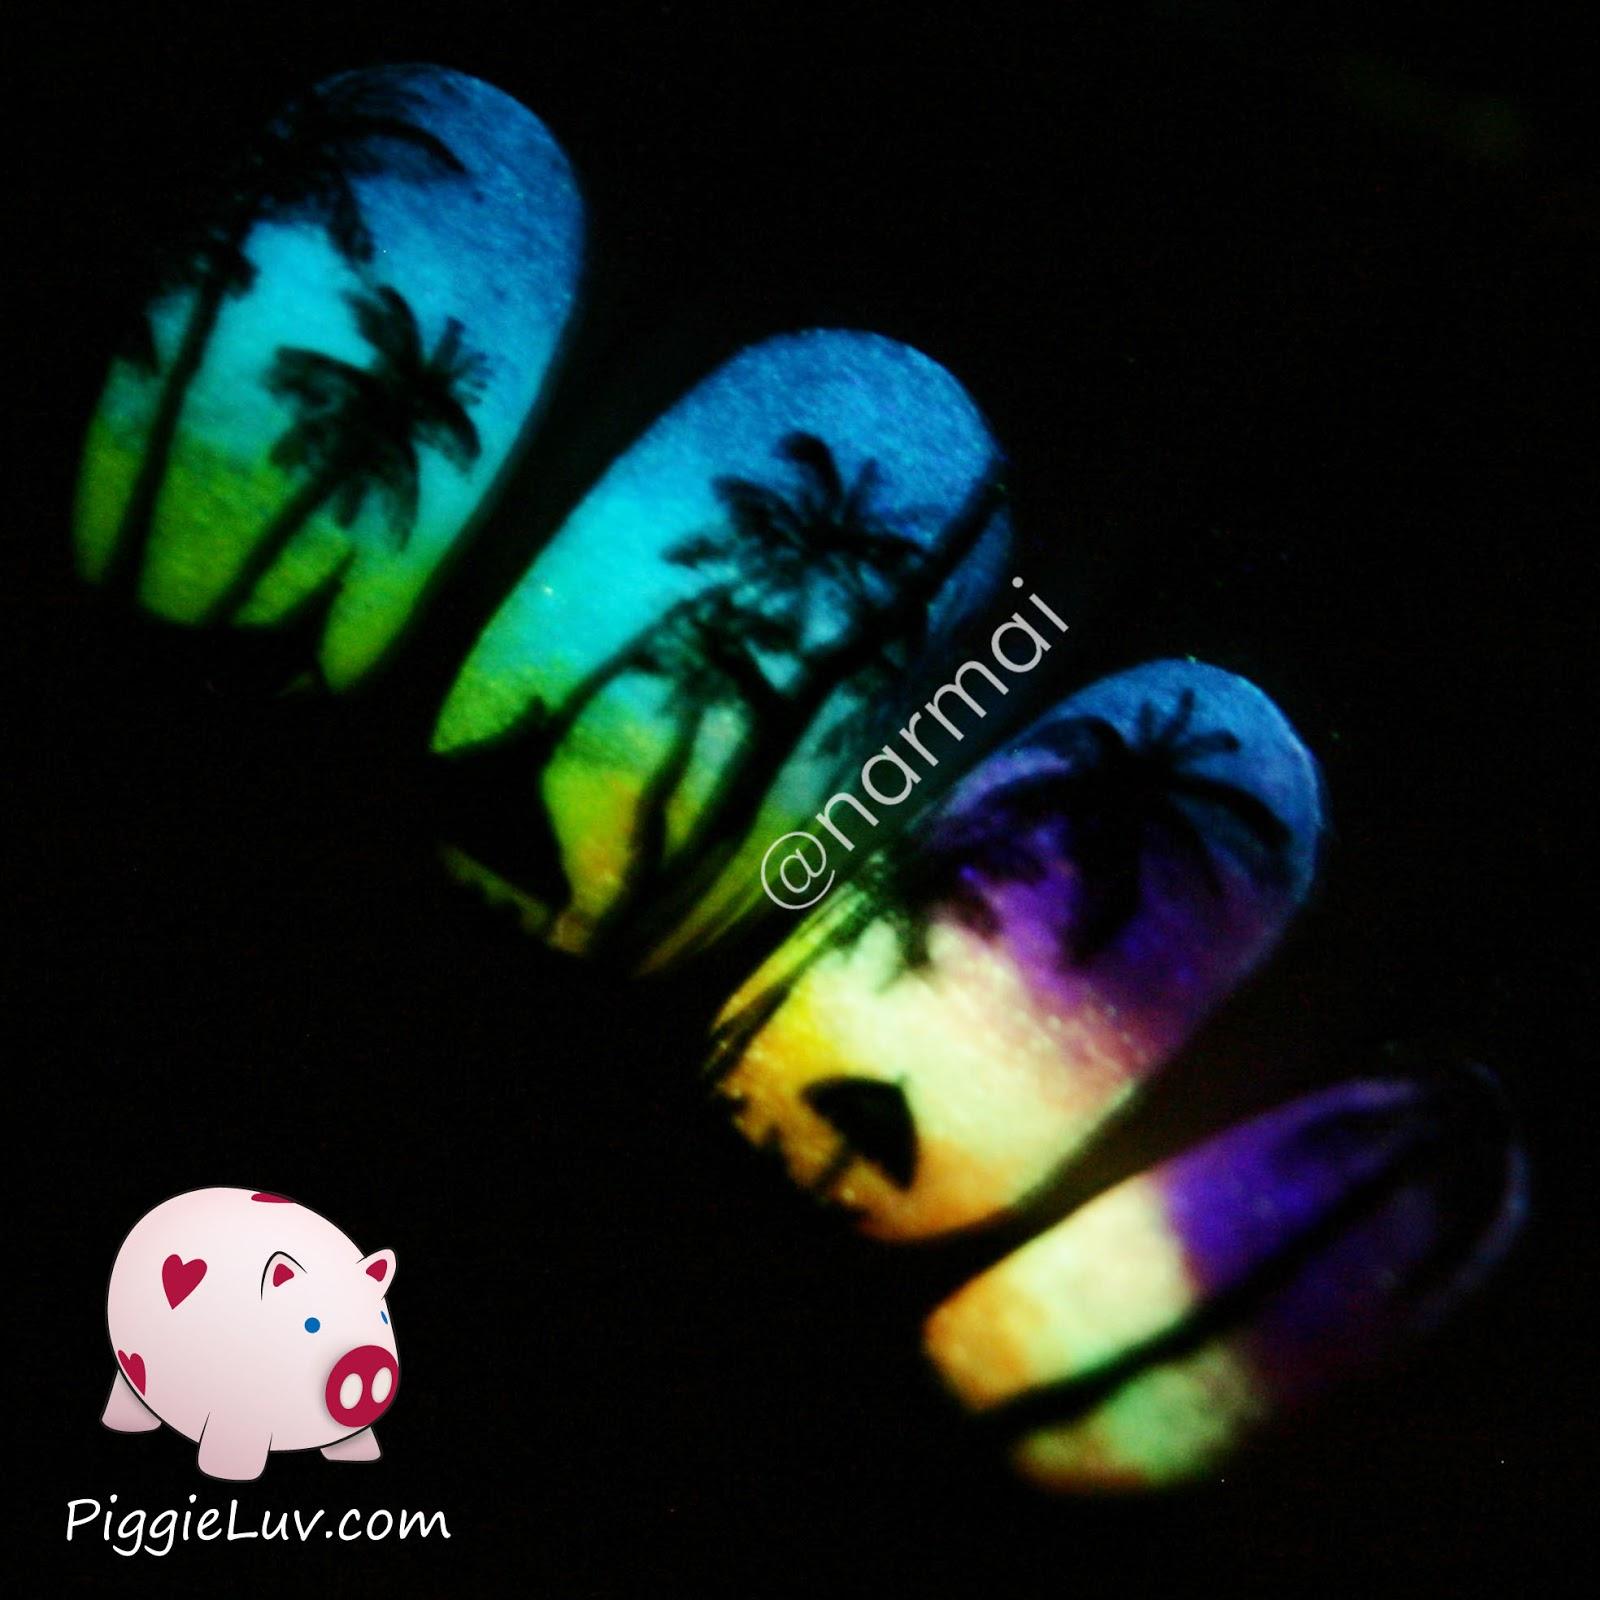 PiggieLuv: 5 tips for taking glow in the dark nail photos!